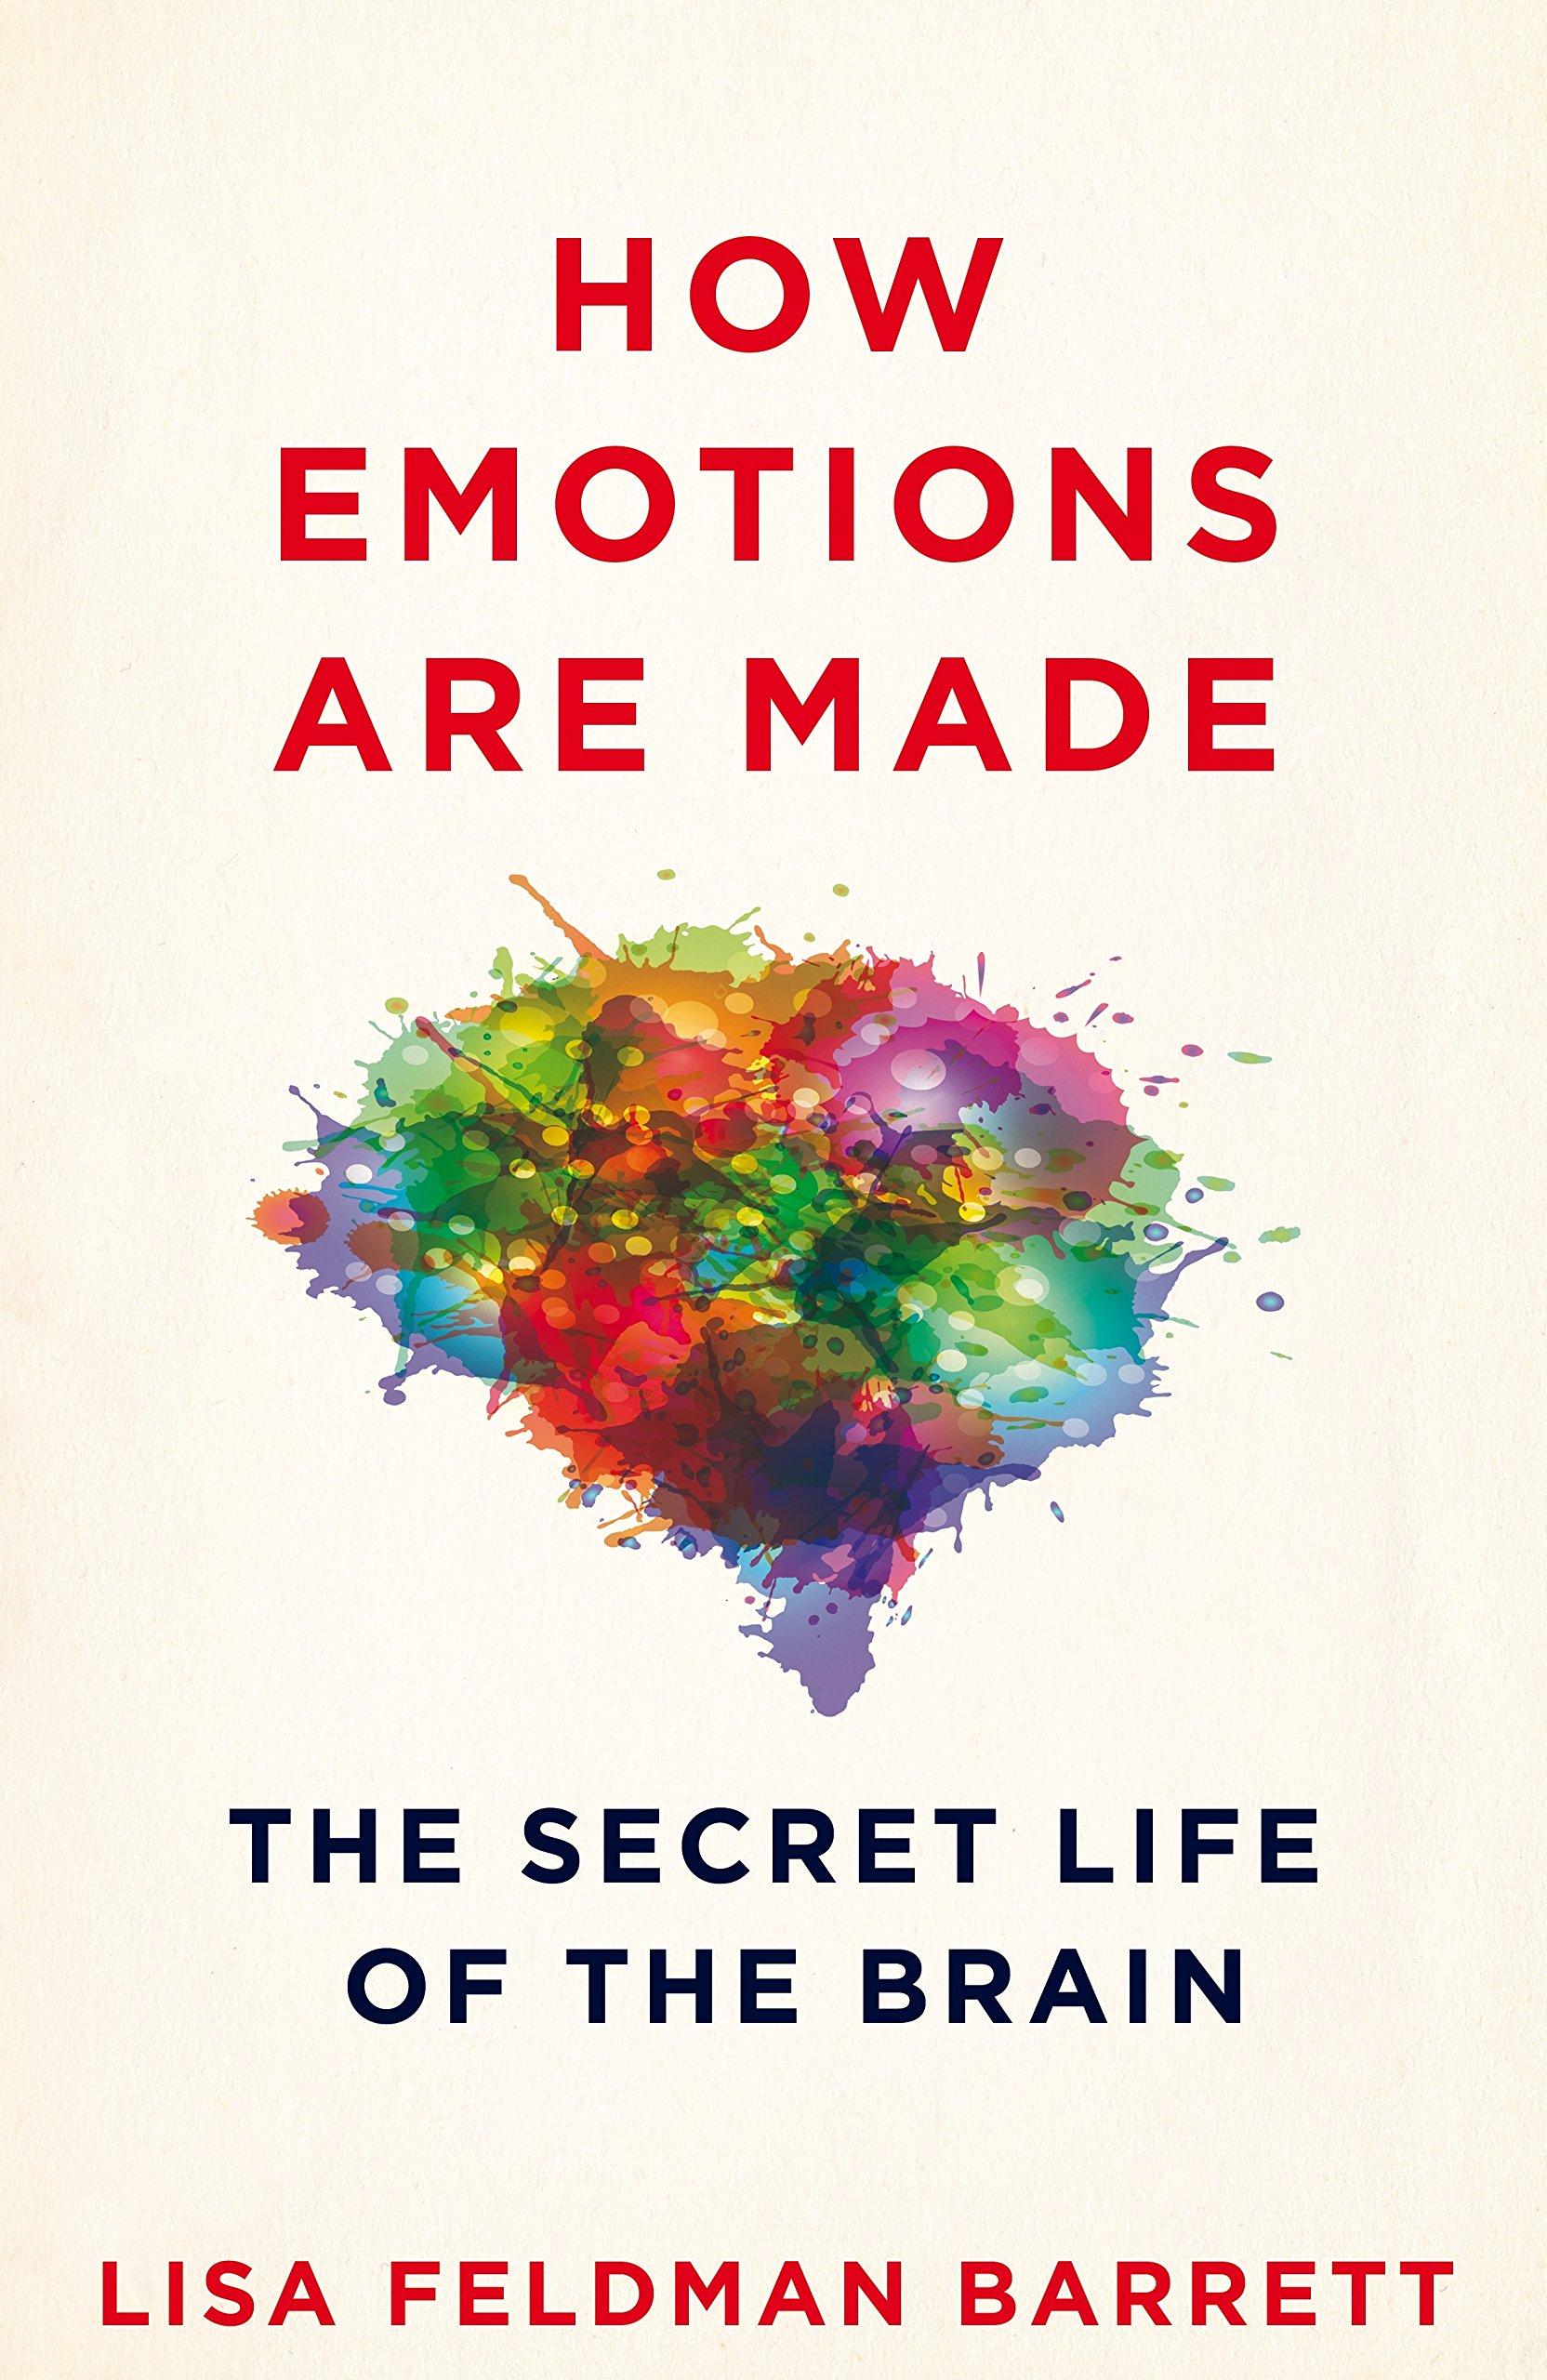 How Emotions Are Made: The Secret Life of the Brain, Lisa Feldman Barrett